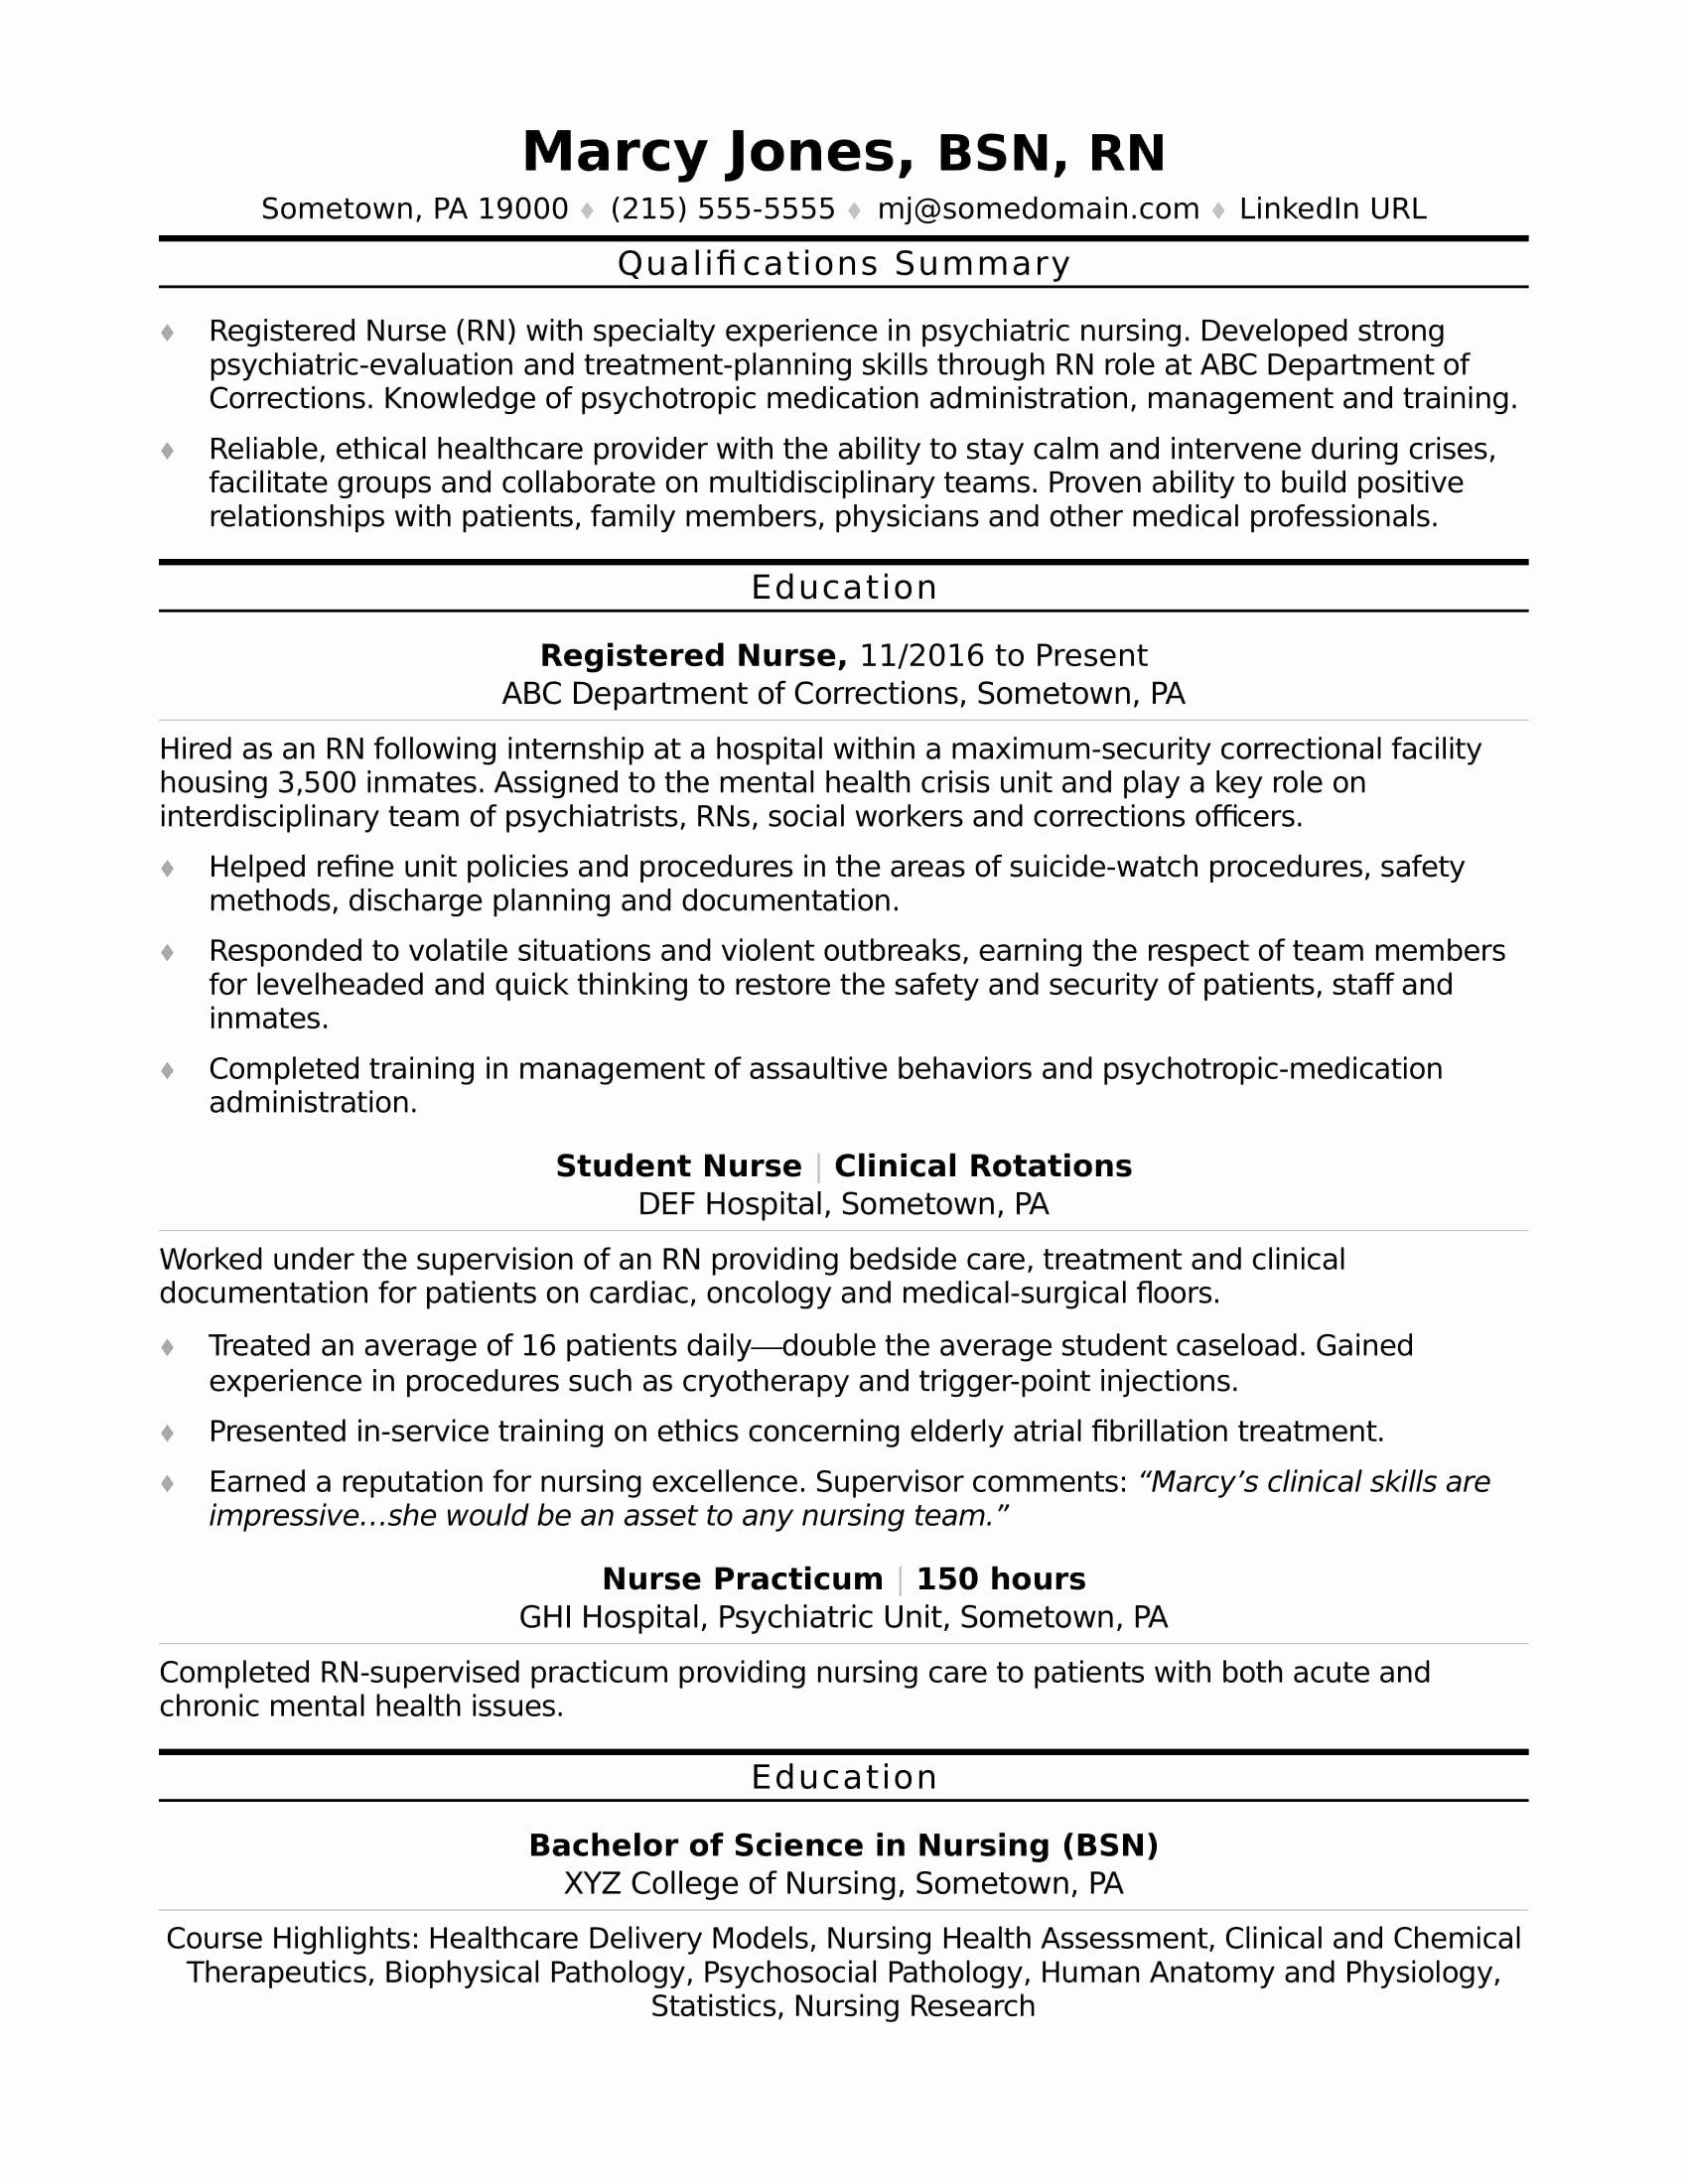 Nursing Student Resume Template Fresh Registered Nurse Rn Resume Sample